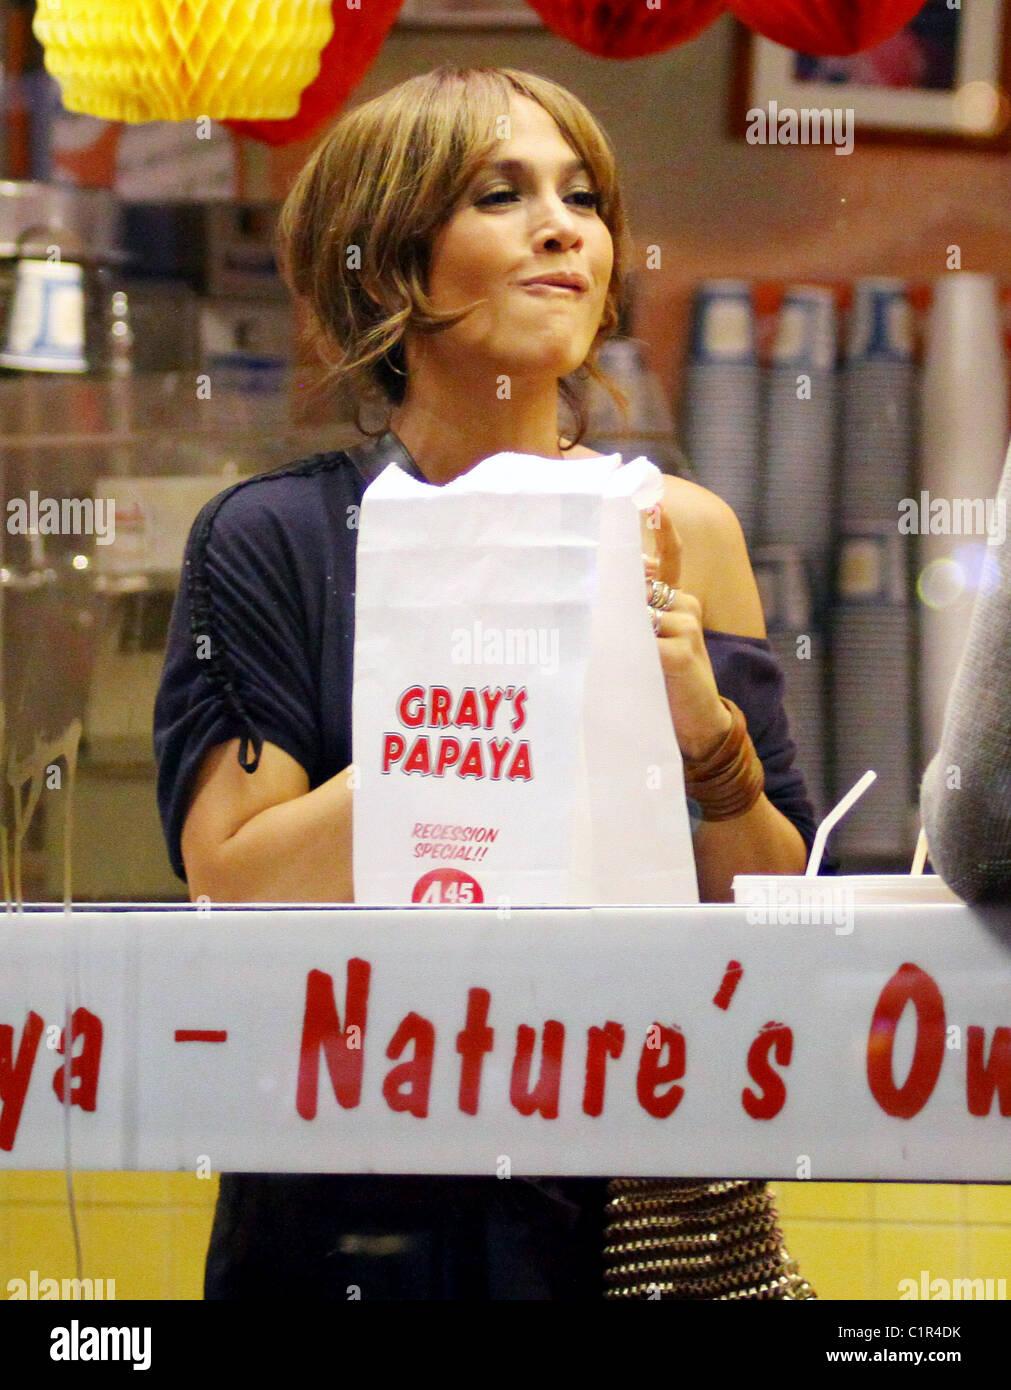 fbbce70cd279b Jennifer Lopez on the set of her new movie 'The Back-Up Plan' filming on  location at Gray's Papaya. New York City, USA -